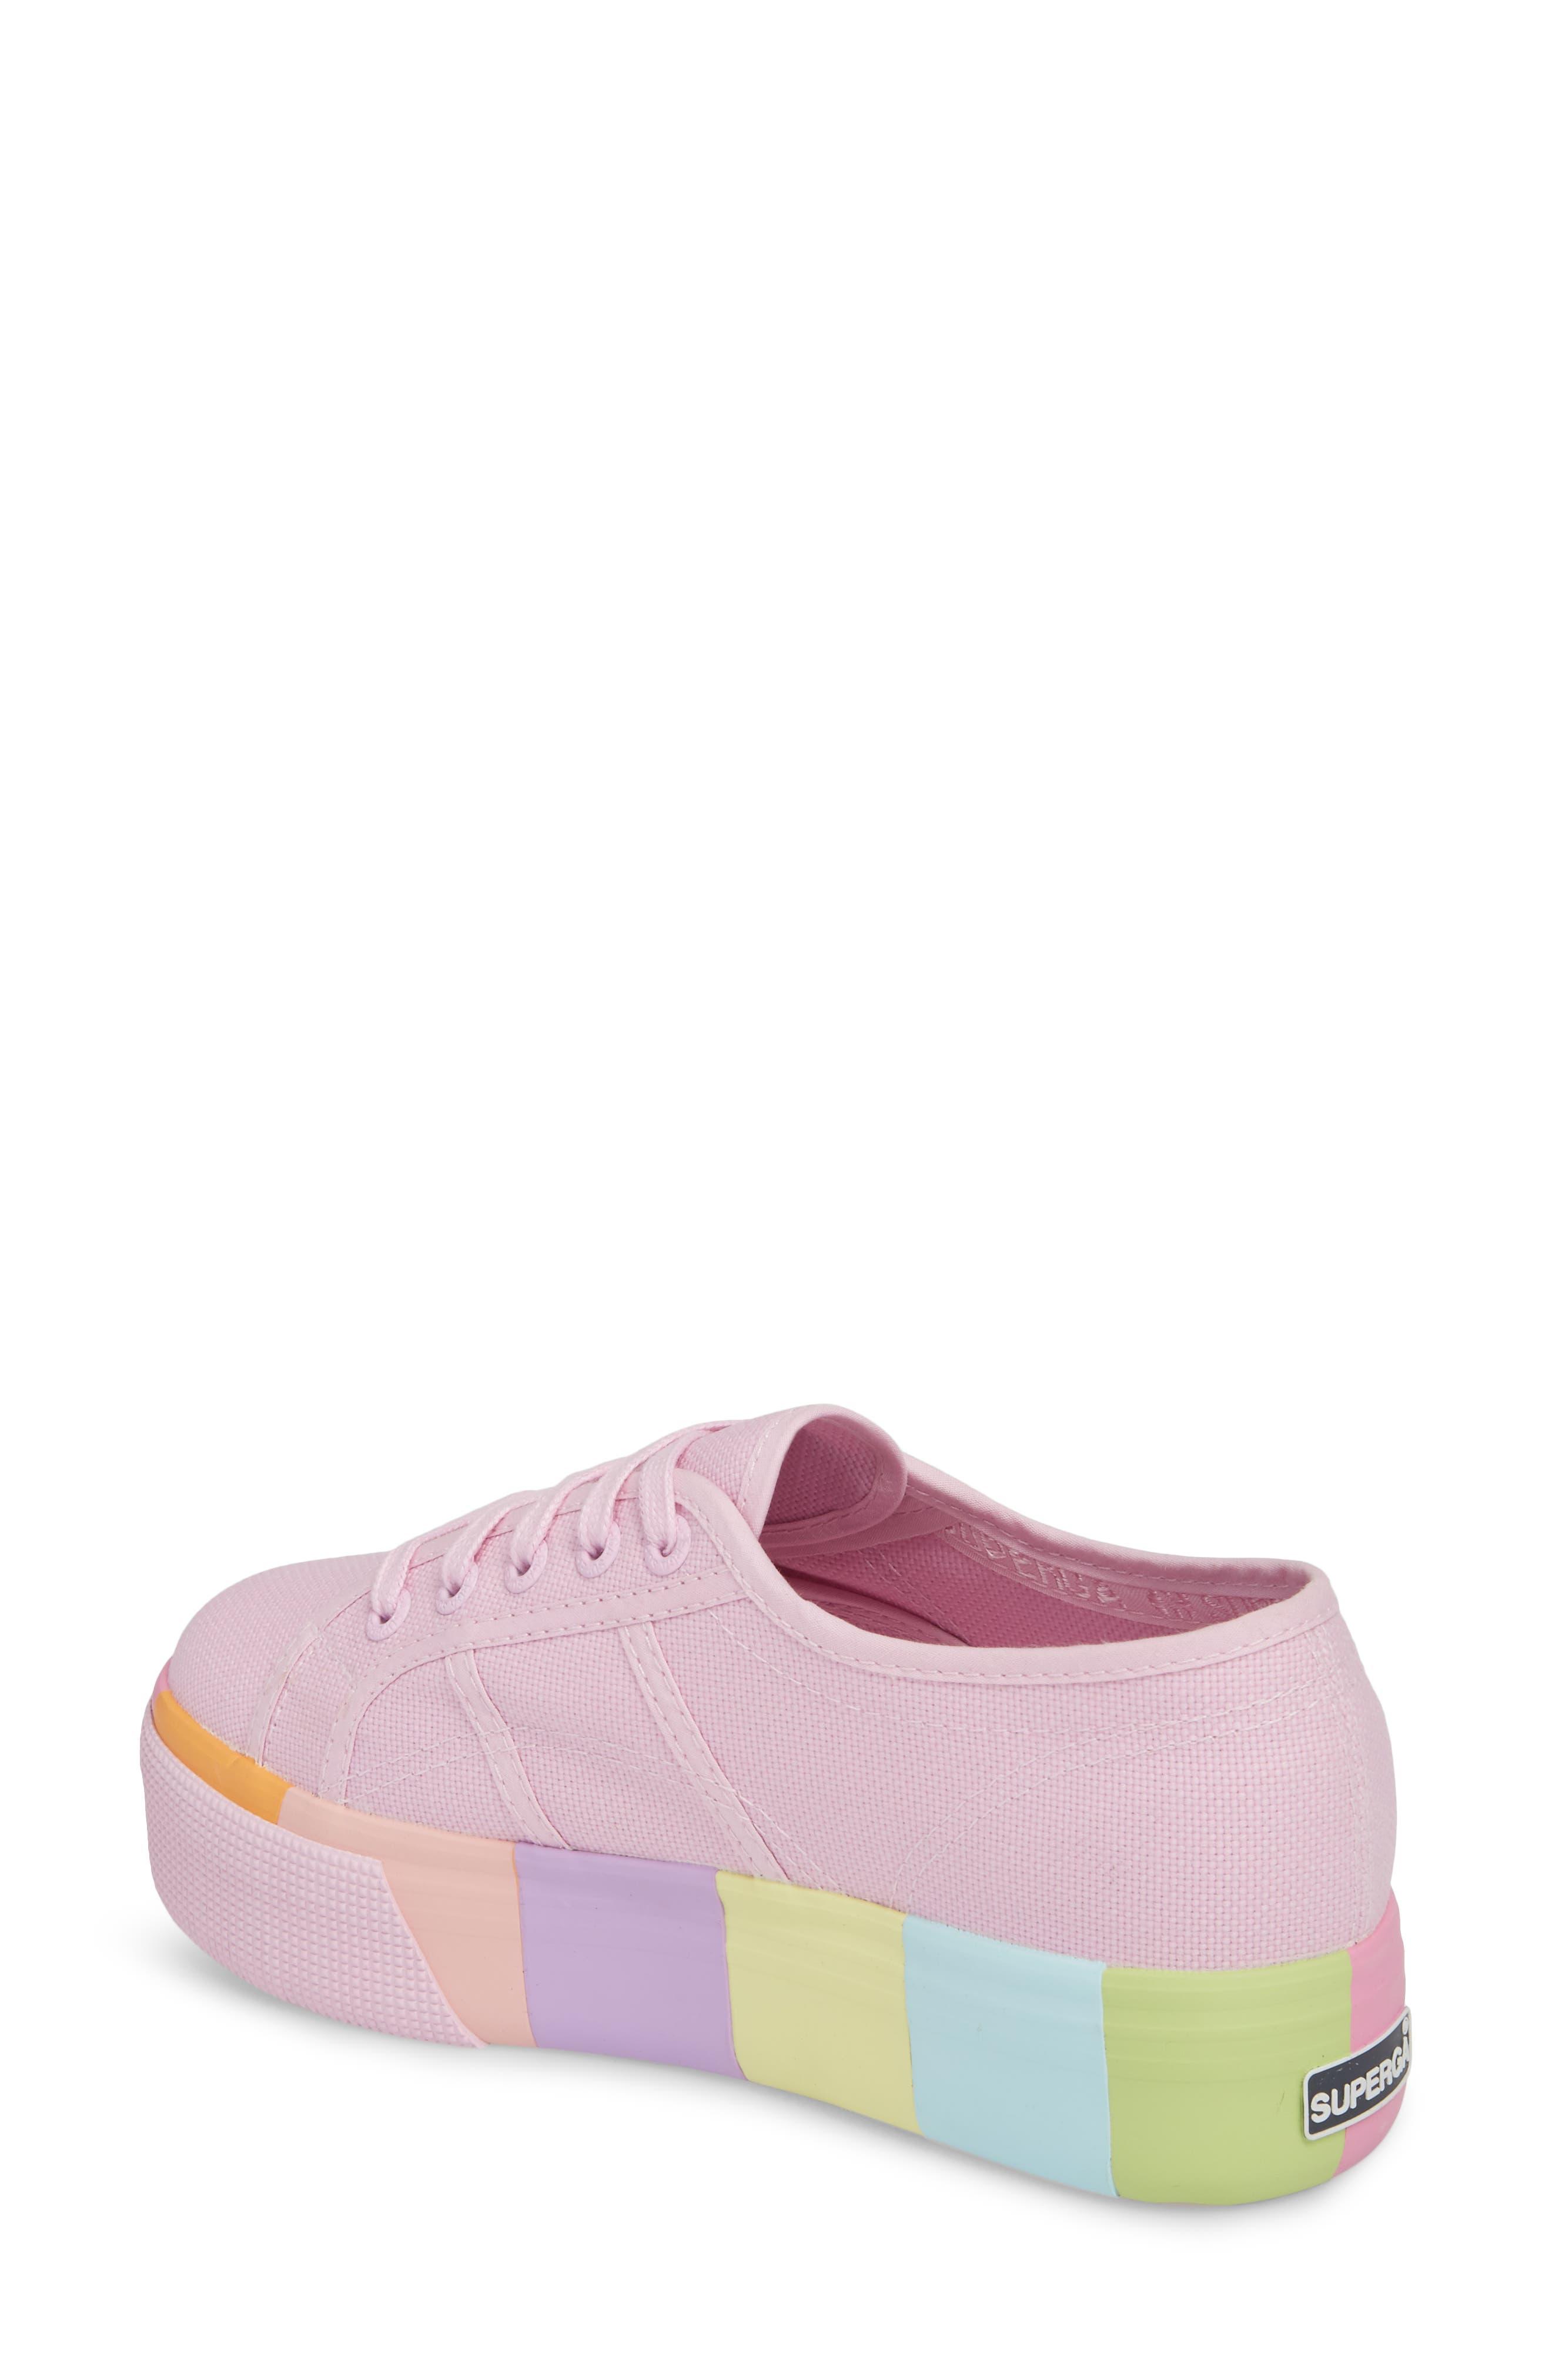 2790 Platform Sneaker,                             Alternate thumbnail 2, color,                             Pink